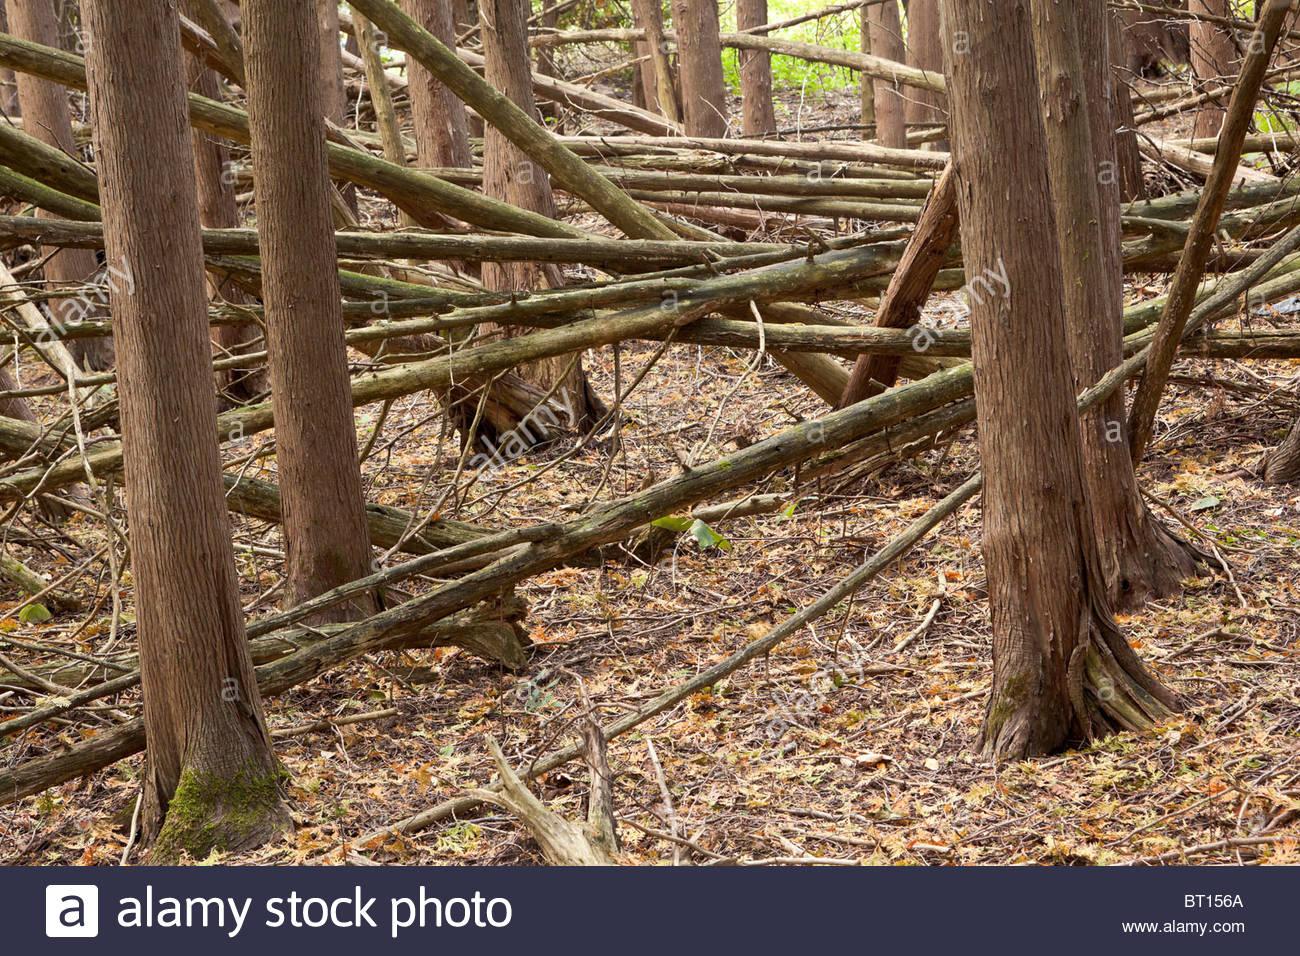 Course Woody Debris (CWD) in cedar grove on the Seaton Trail in Pickering Ontario Canada - Stock Image